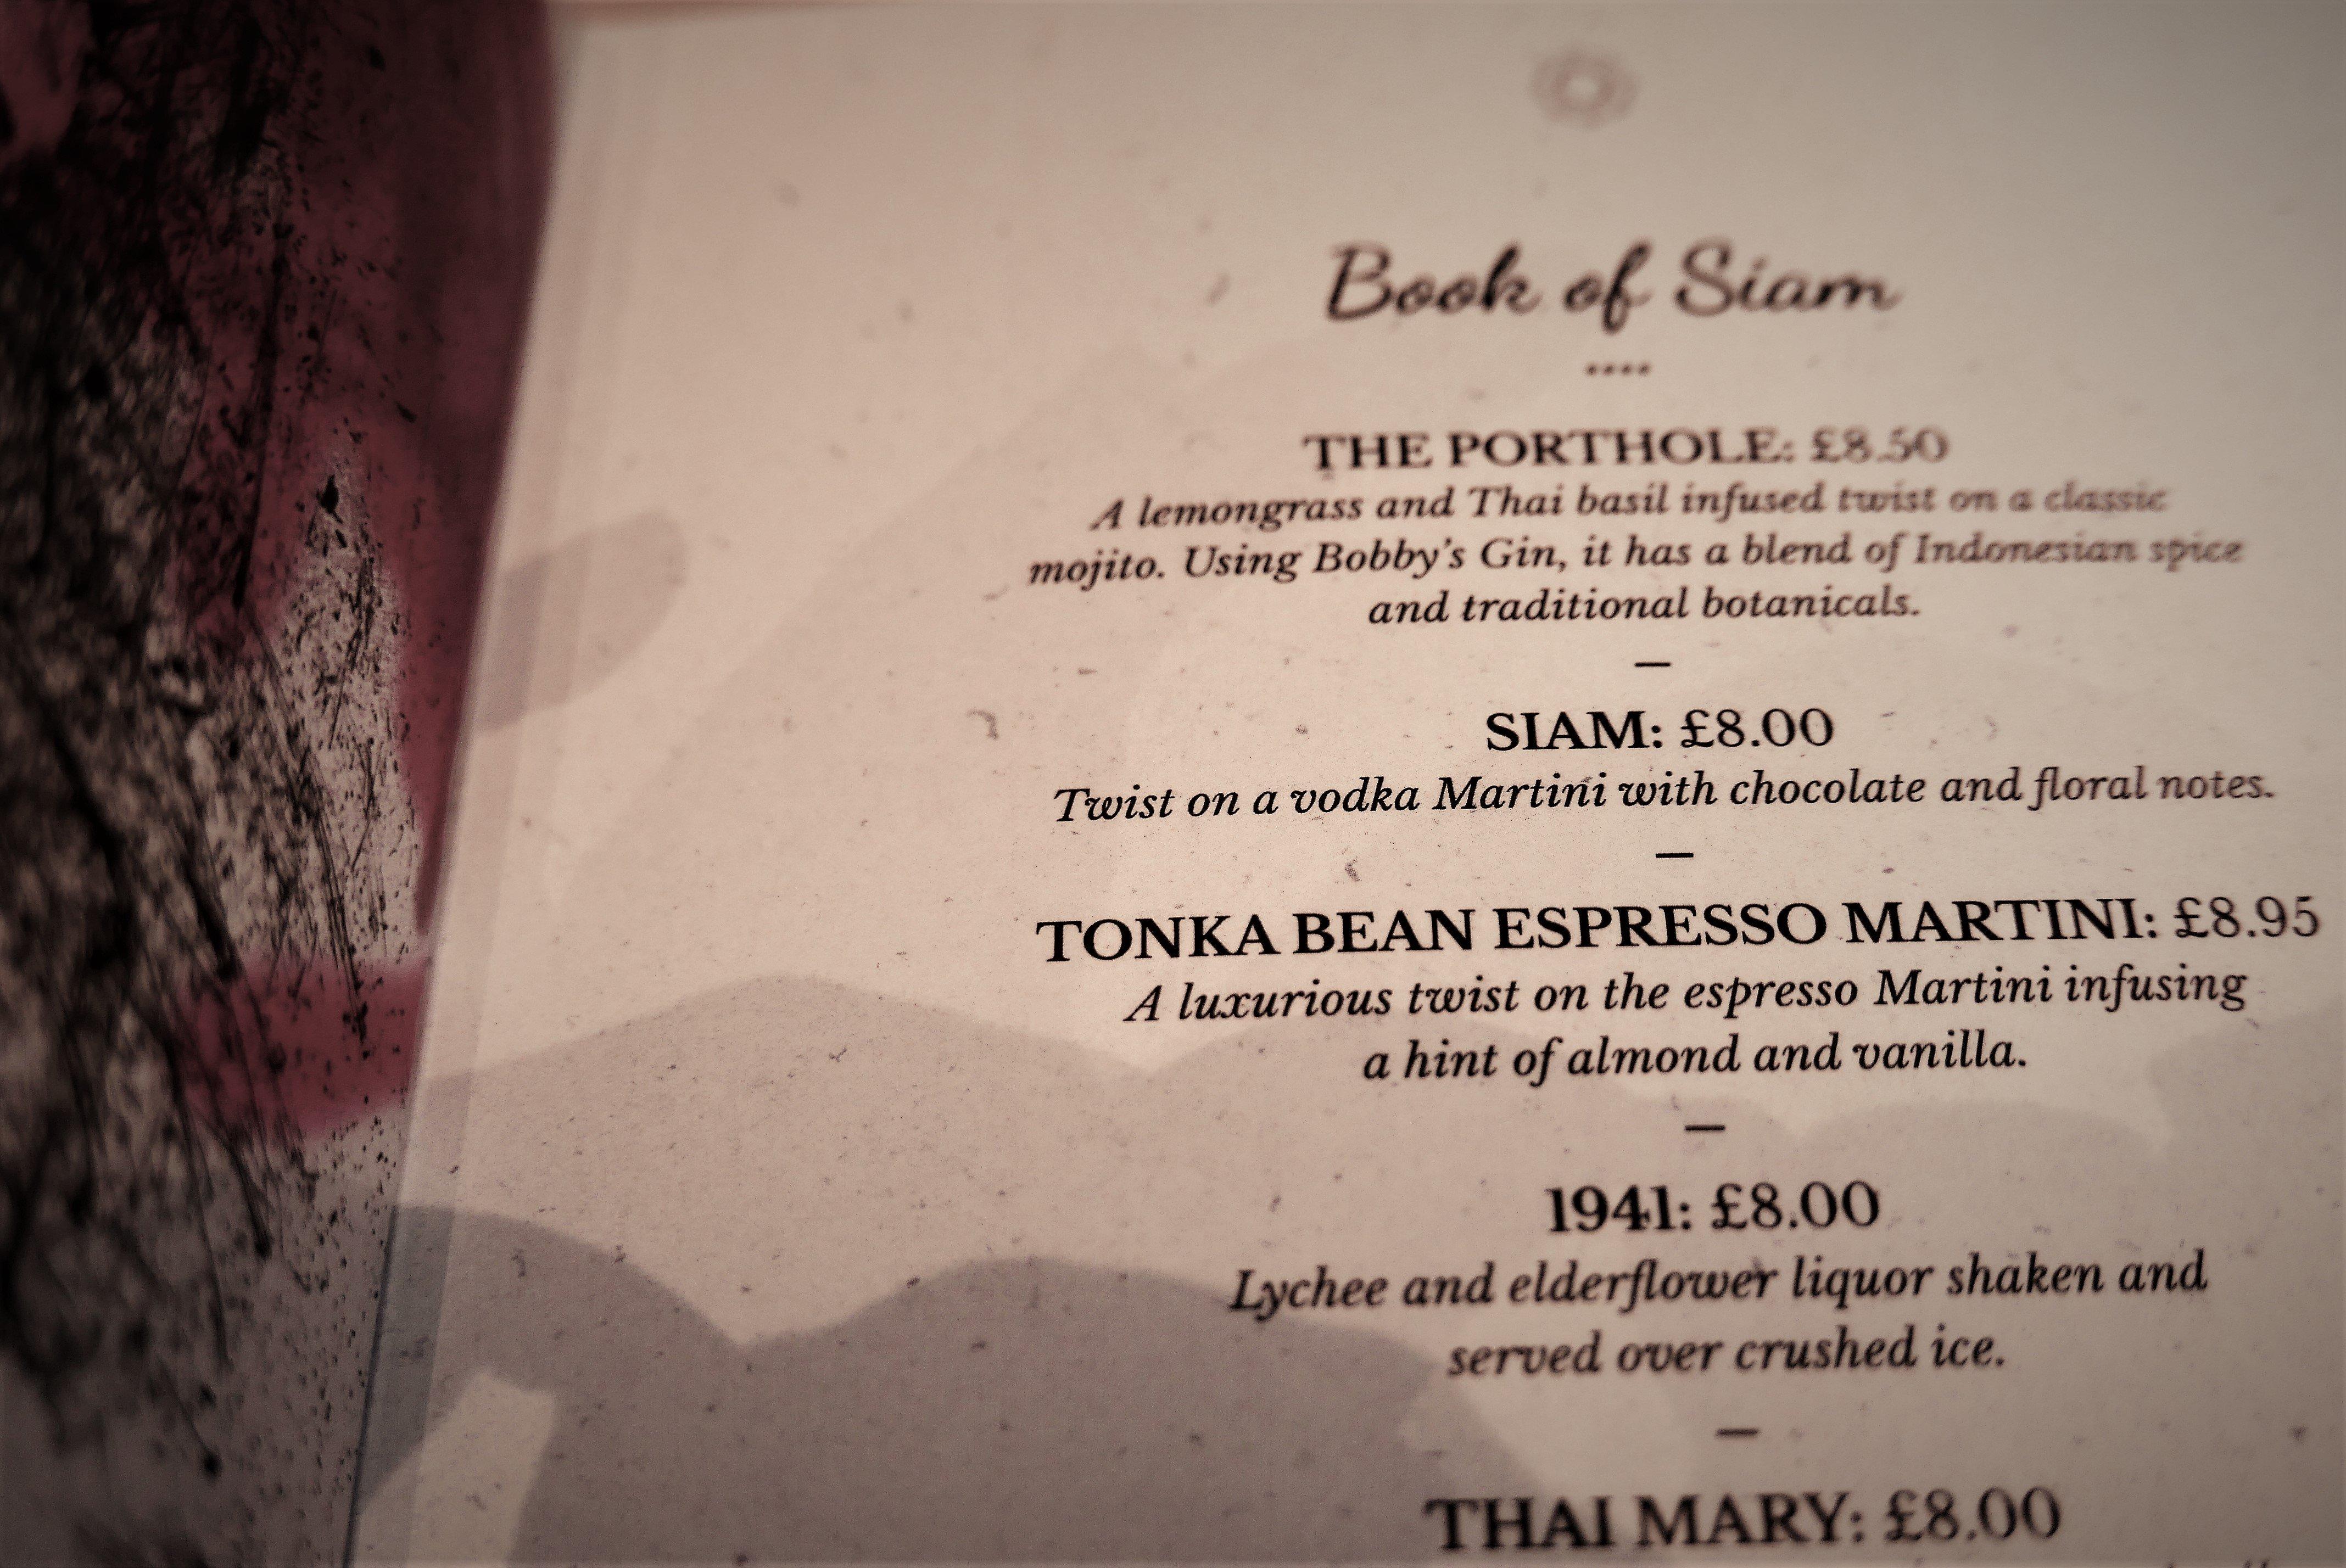 The Cocktail Menu at Siamais